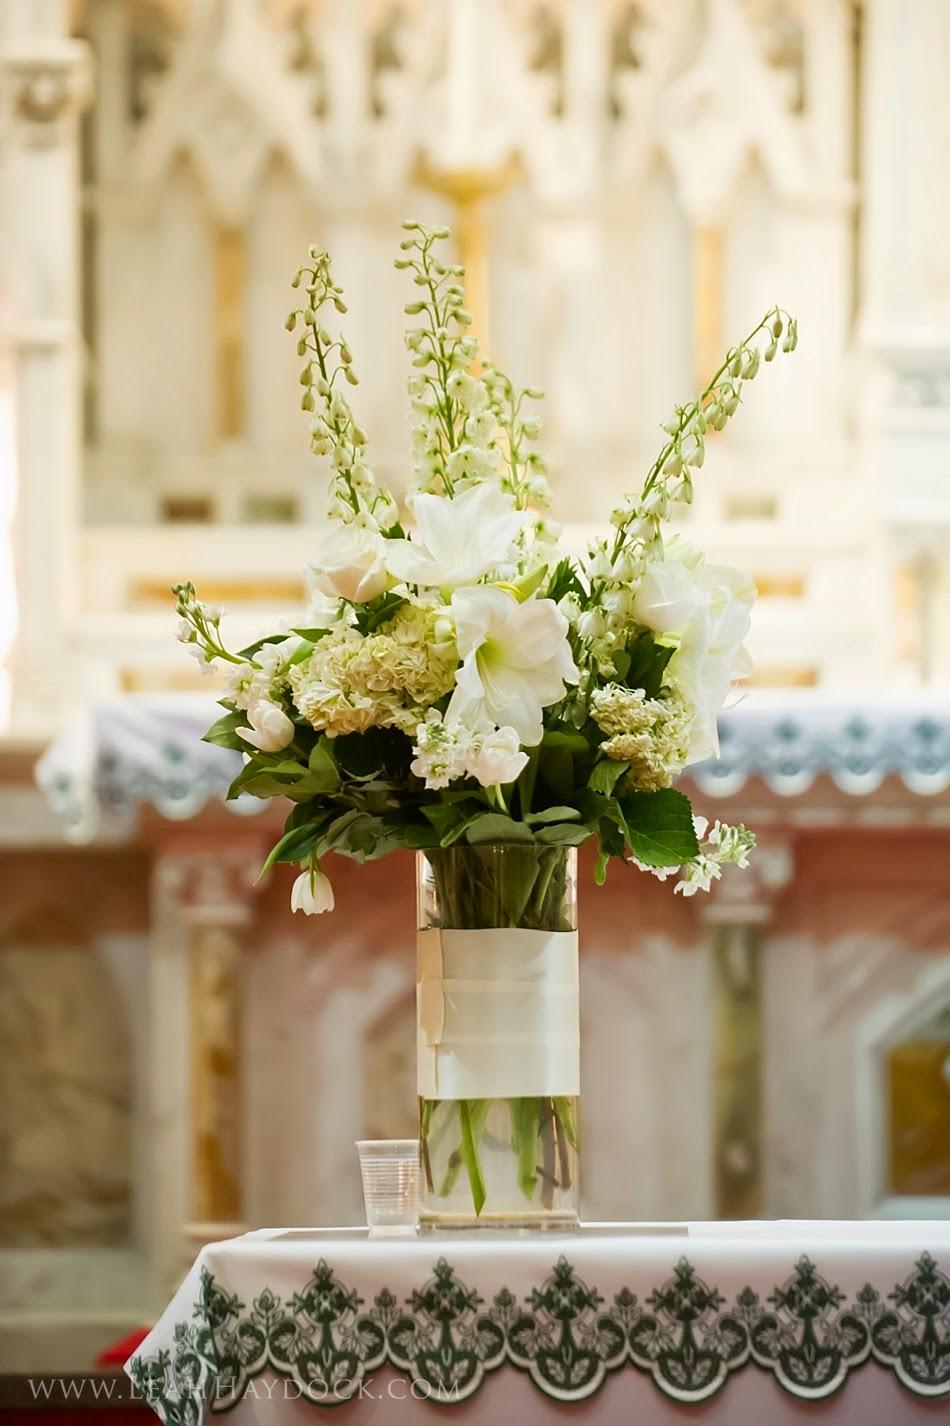 les fleurs : leah haydock photography : boston harbor hotel : winter wedding : white ceremony arrangements in glass cylinders